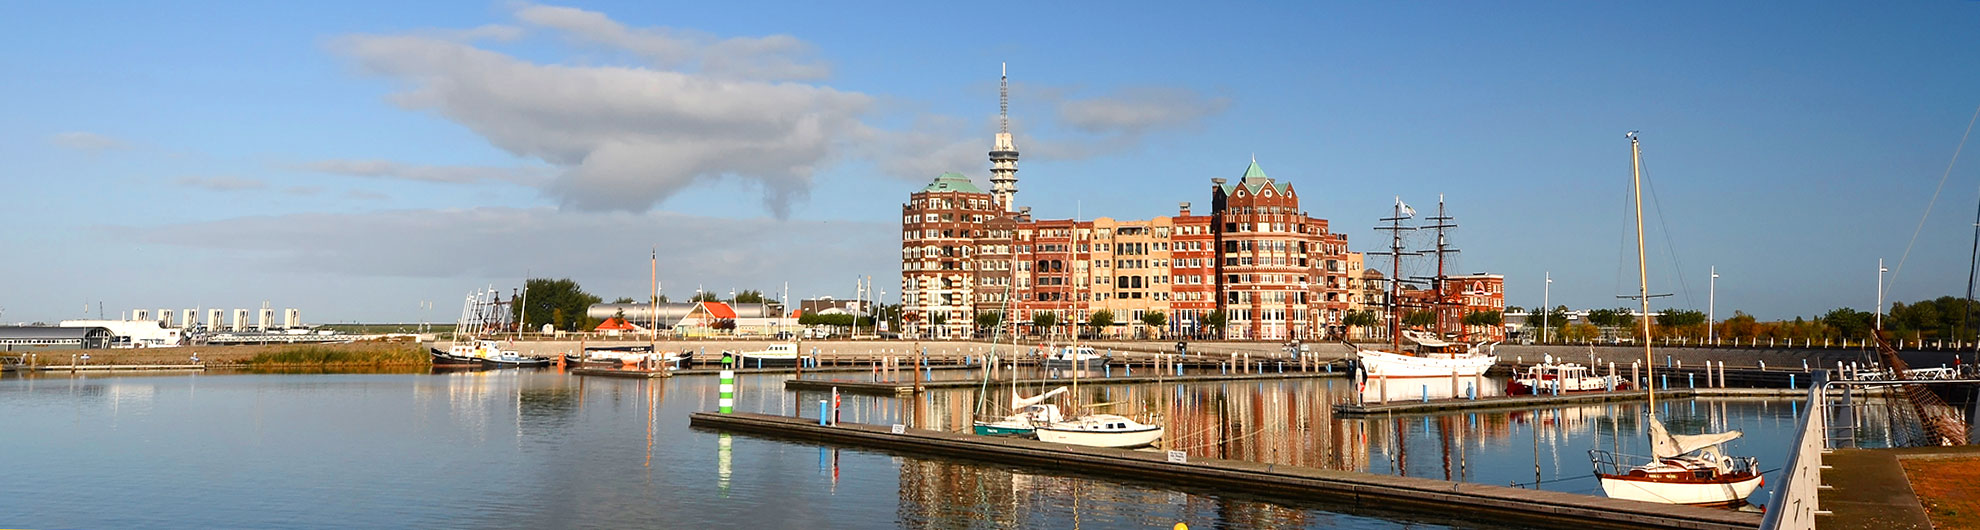 Batavia Haven